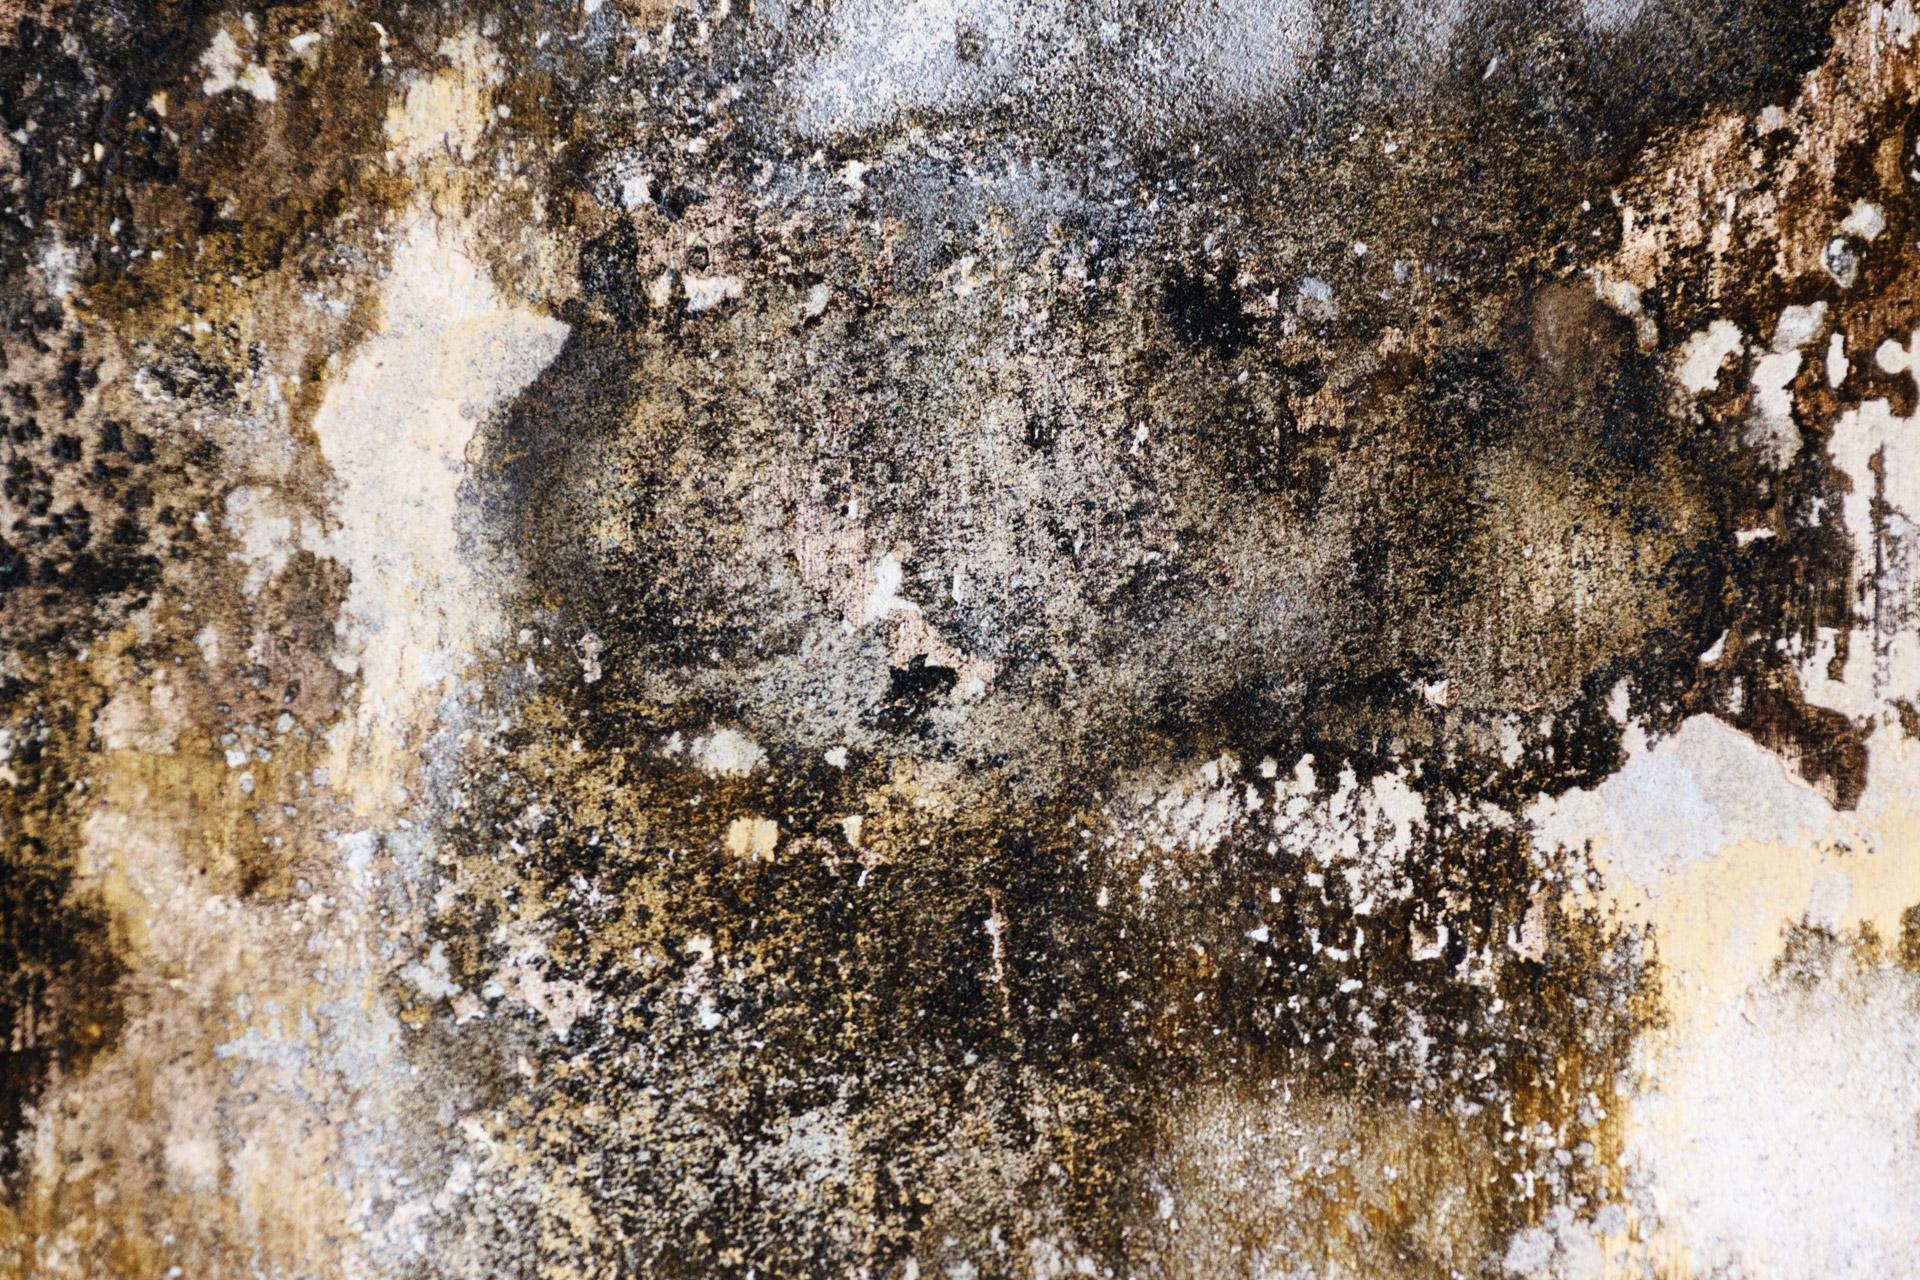 surviving toxic mold mold exposure mold illness mold testing mold prevention. Black Bedroom Furniture Sets. Home Design Ideas